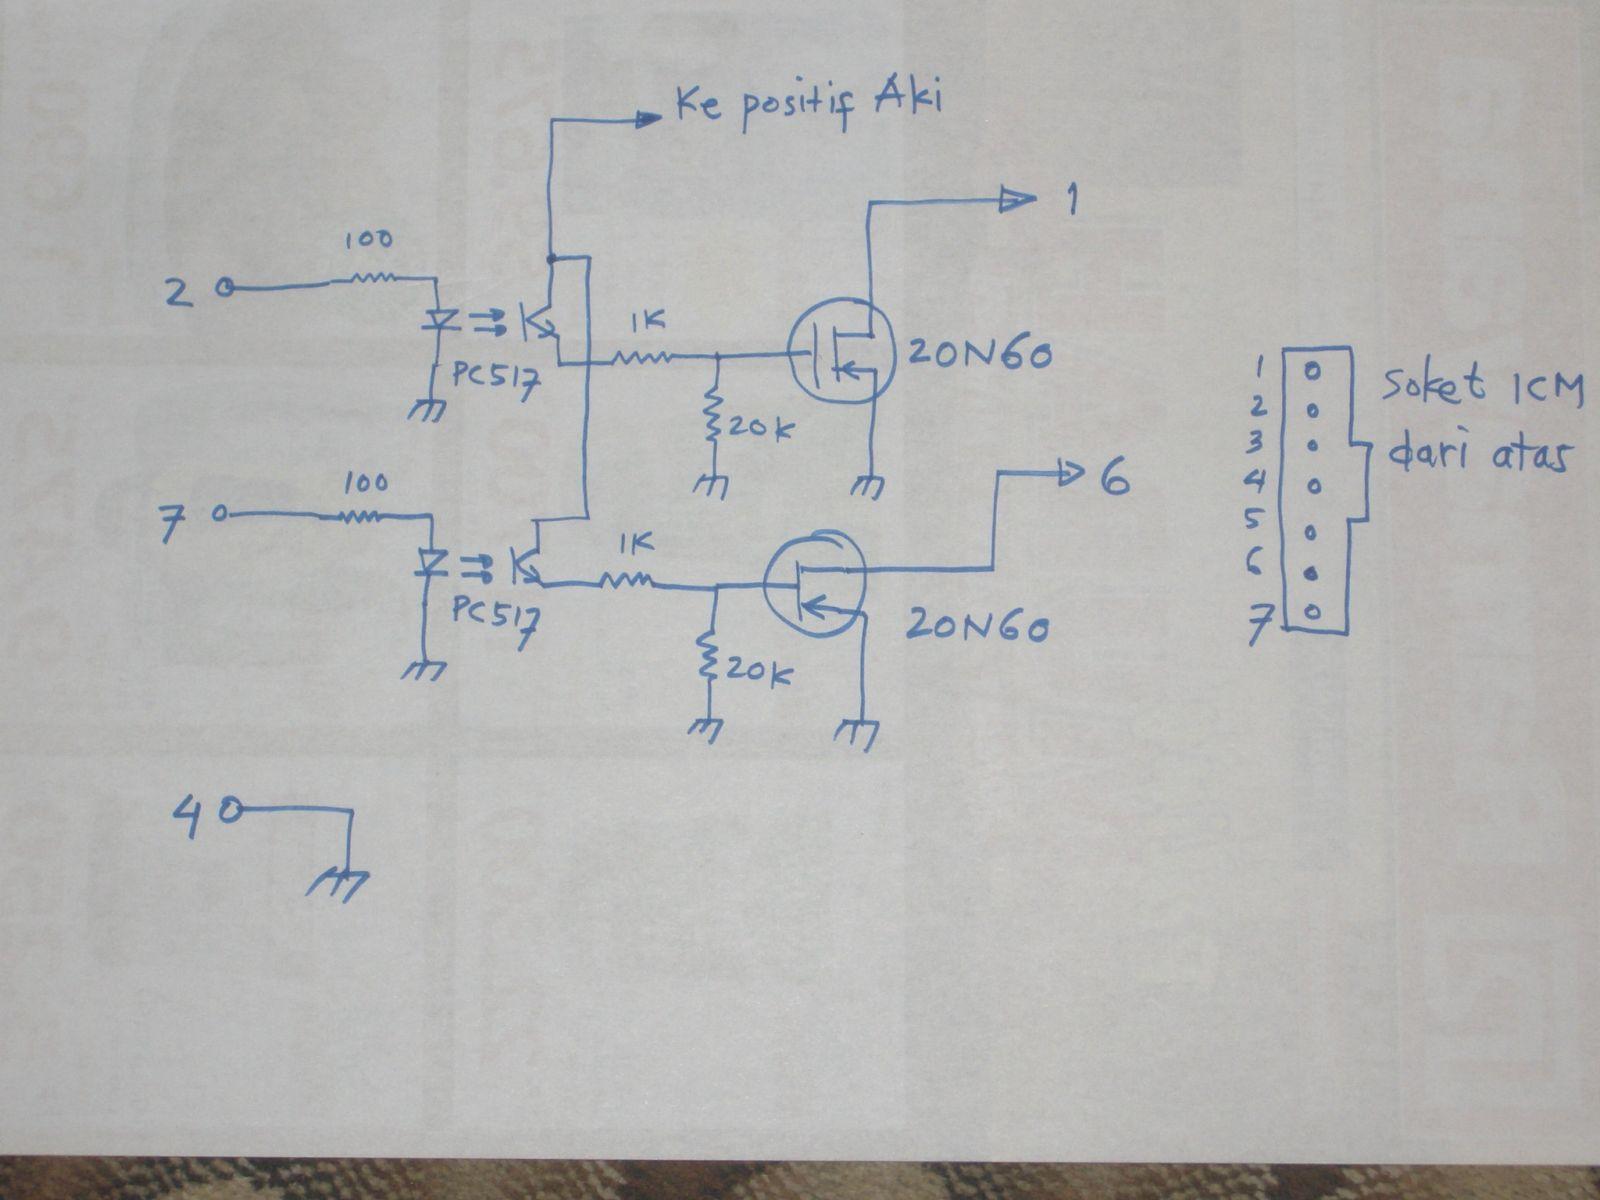 Otak Atik Blazer Sendiri Membuat Icm Wiring Diagram Opel Montera Gambar Rangkaian Pengganti